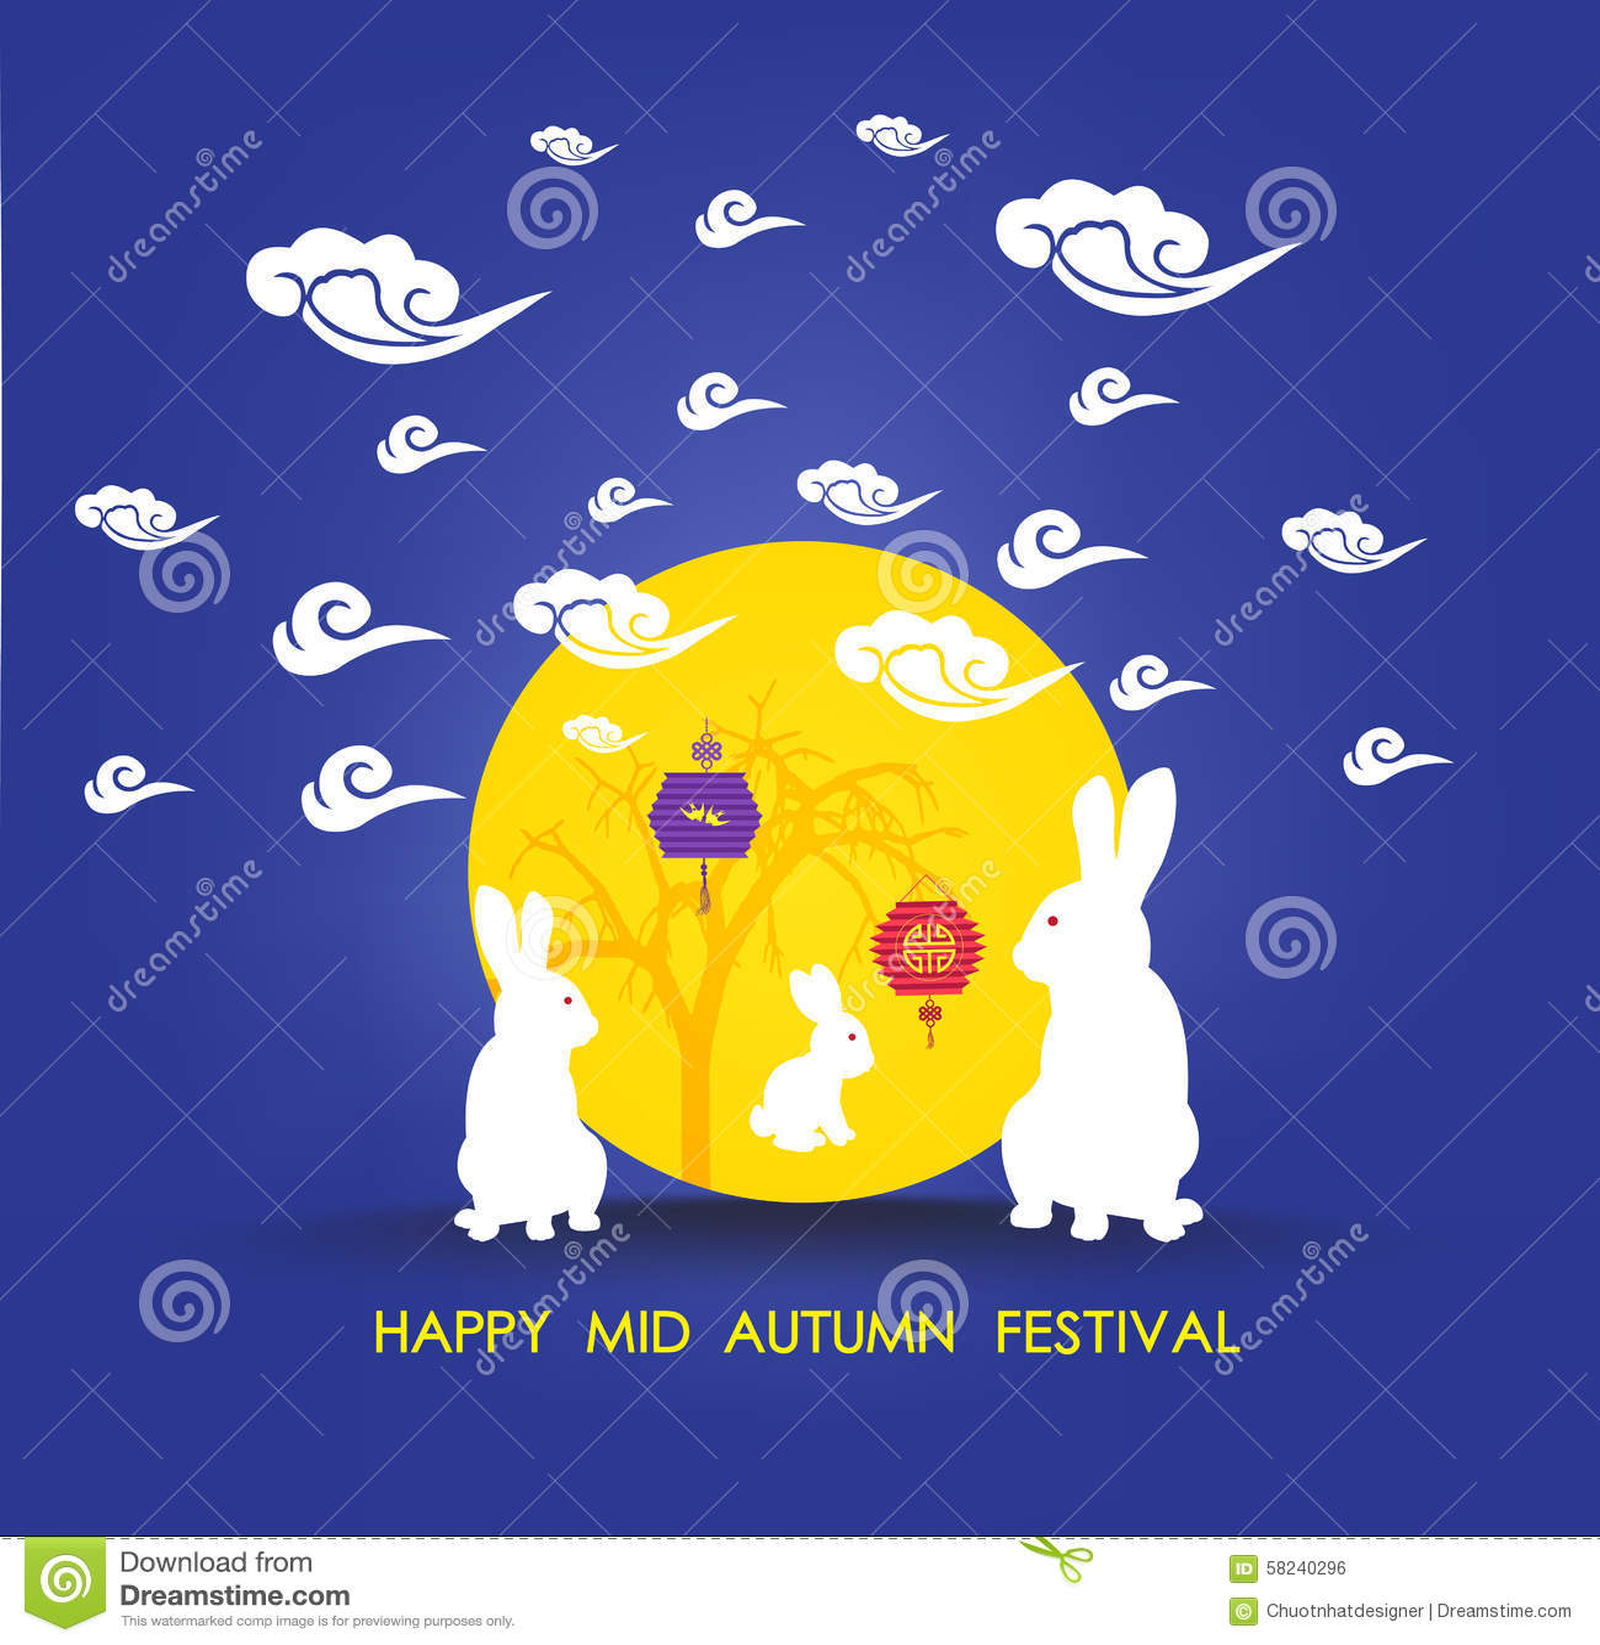 Cute Cartoon Family Wallpaper Mid Autumn Lantern Festival Full Moon And Rabbit Family